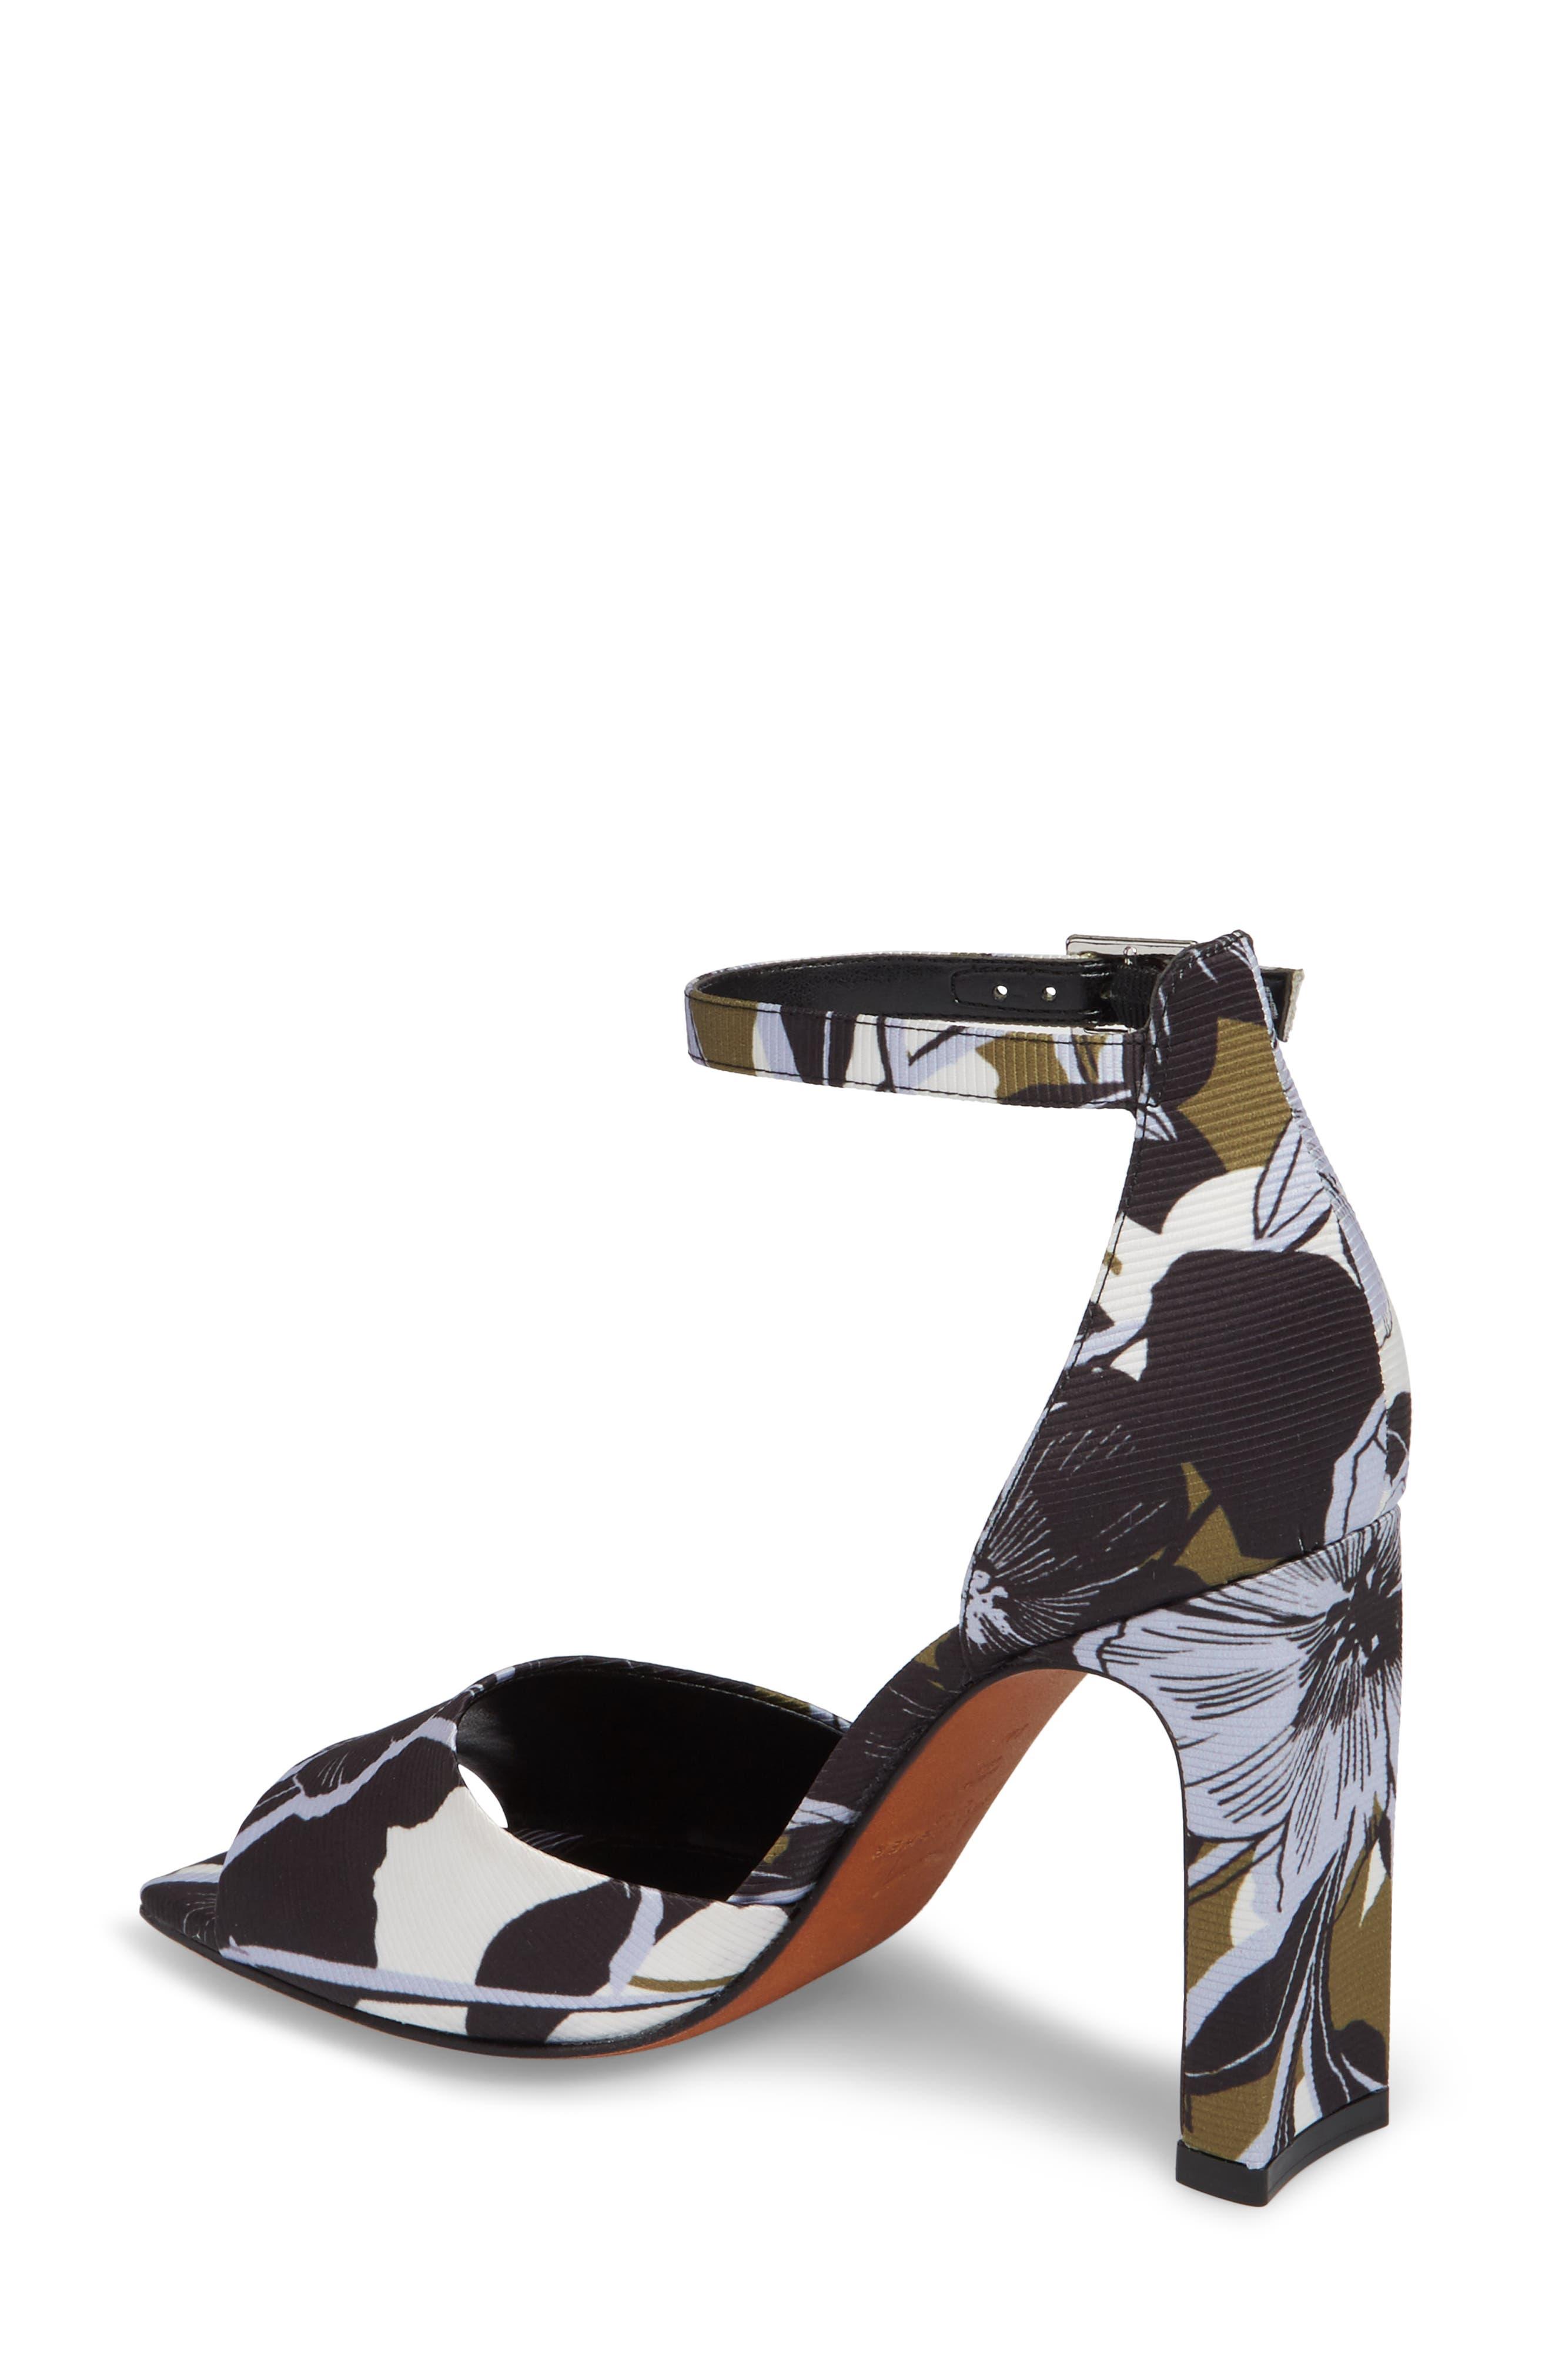 Harlin Ankle Strap Sandal,                             Alternate thumbnail 2, color,                             001